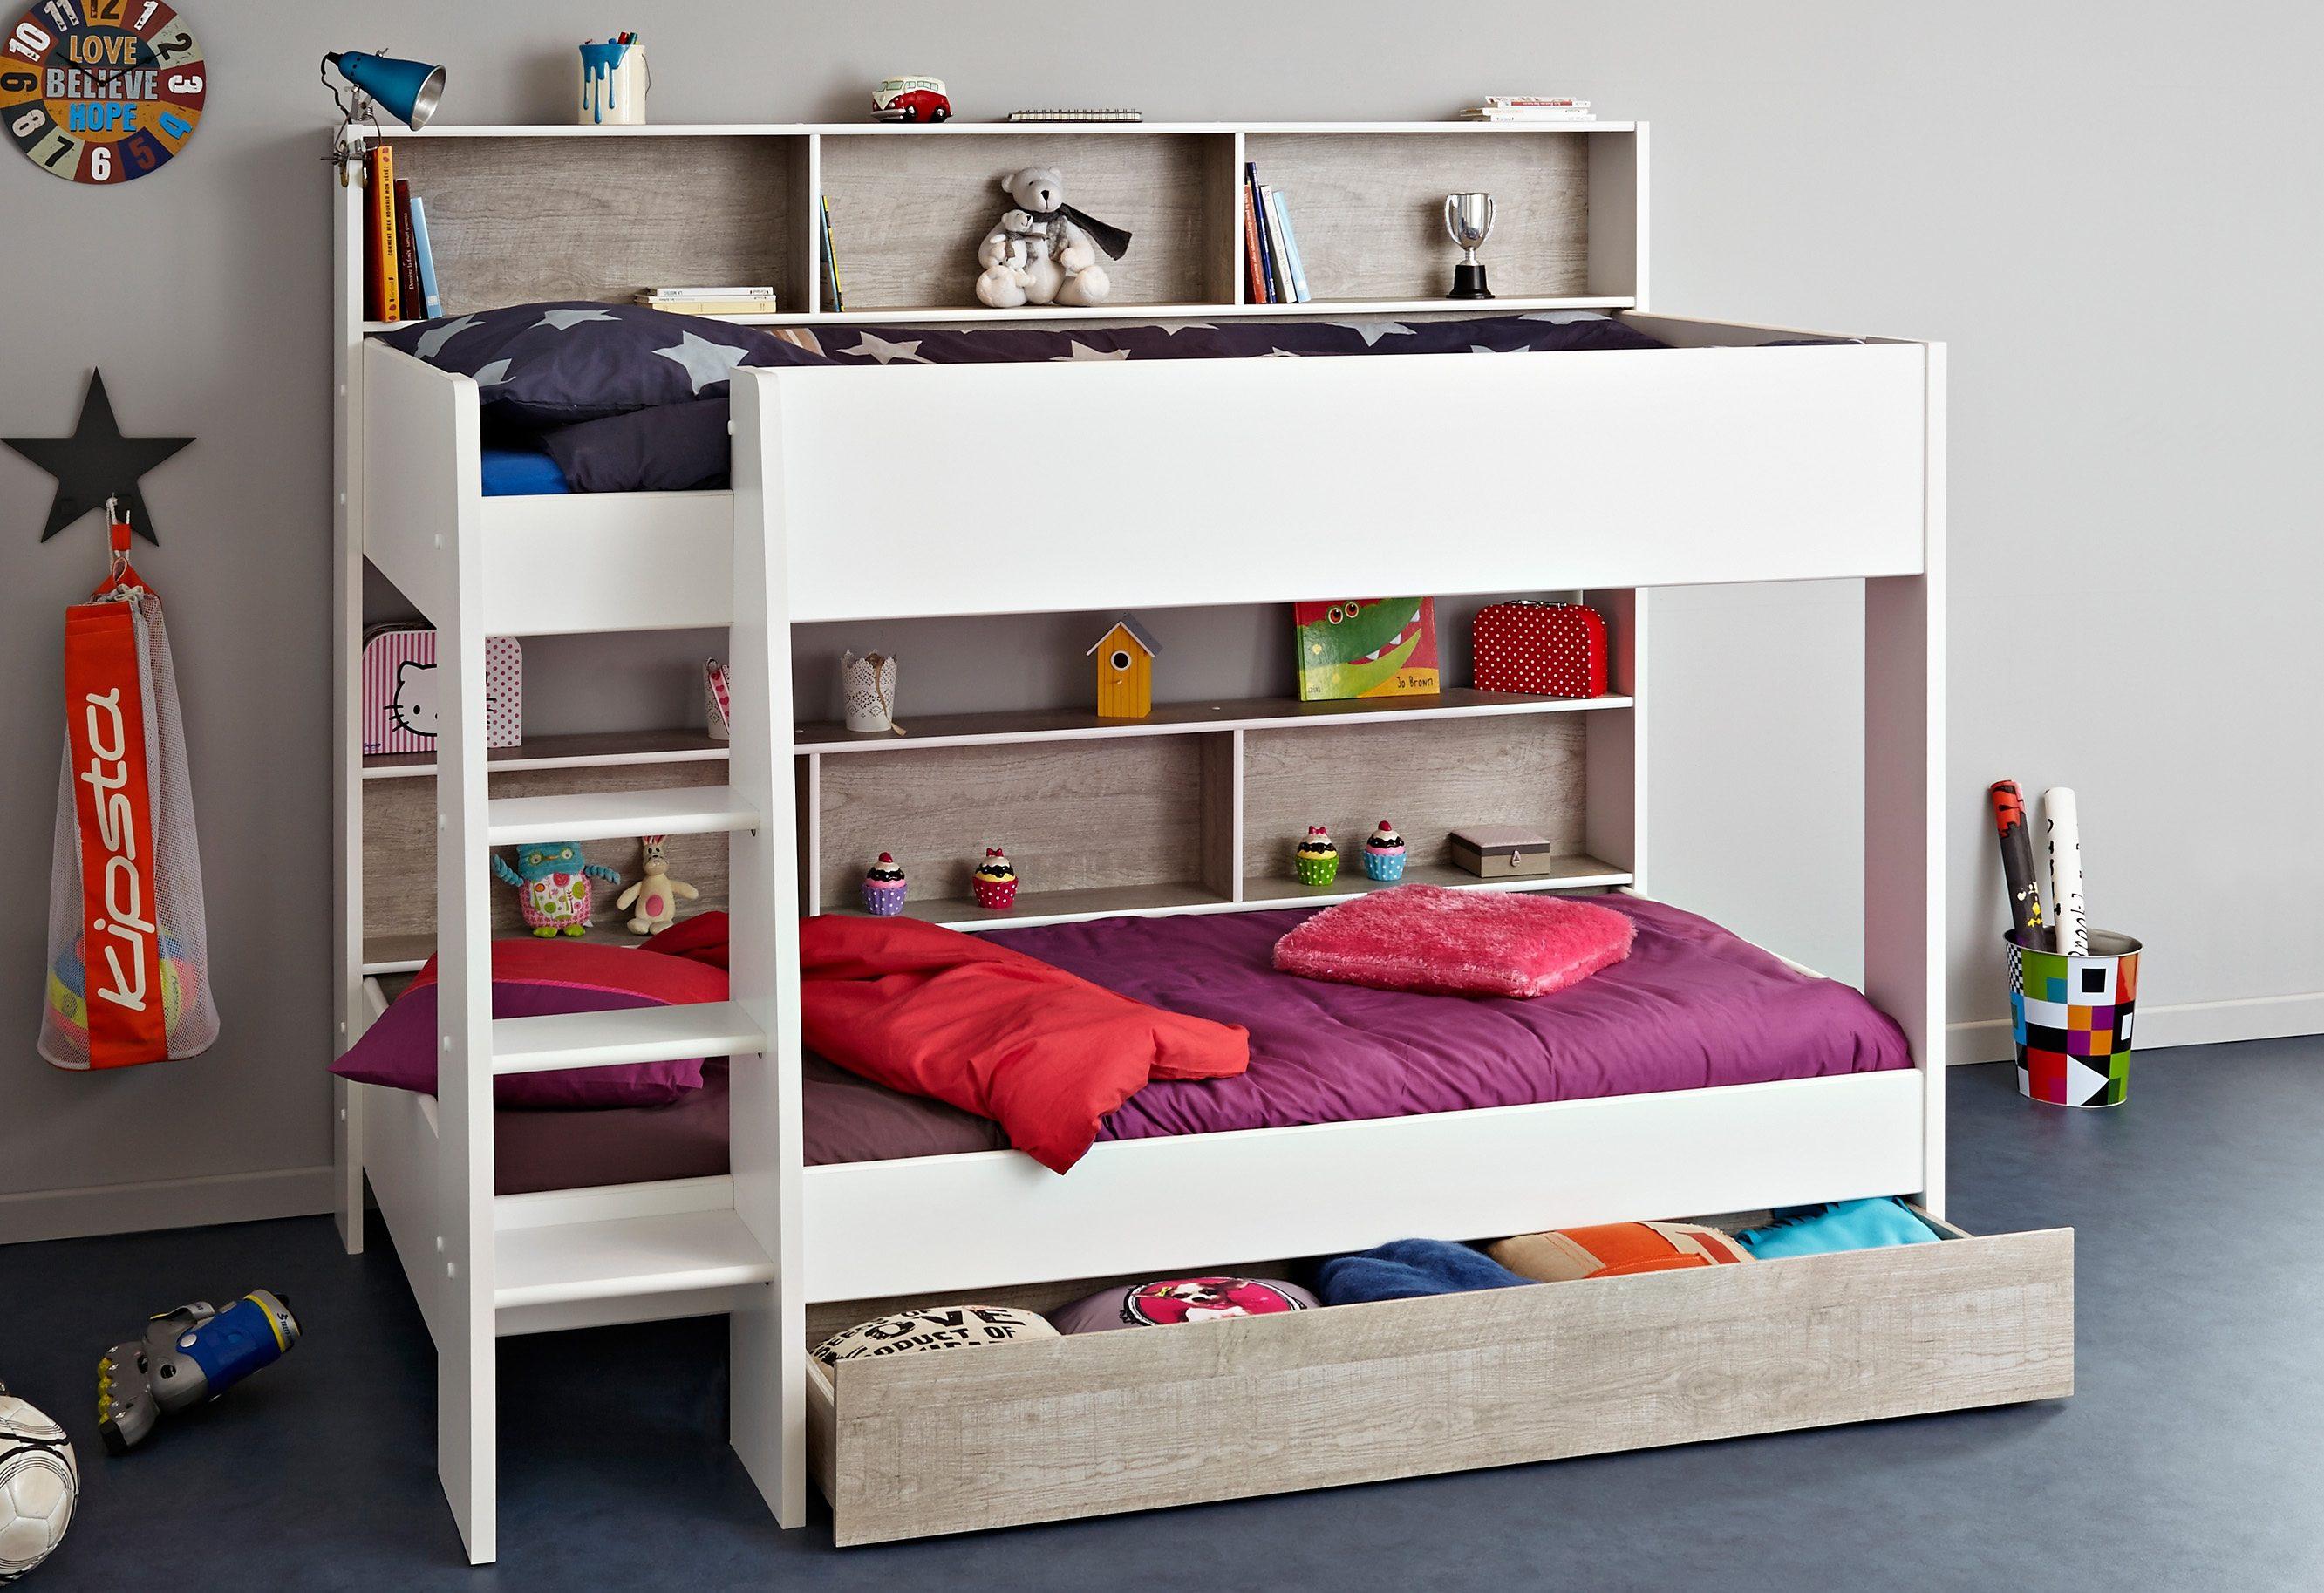 Kinderzimmer Mit Etagenbett : Etagenbett doppelstockbett online kaufen stockbett otto